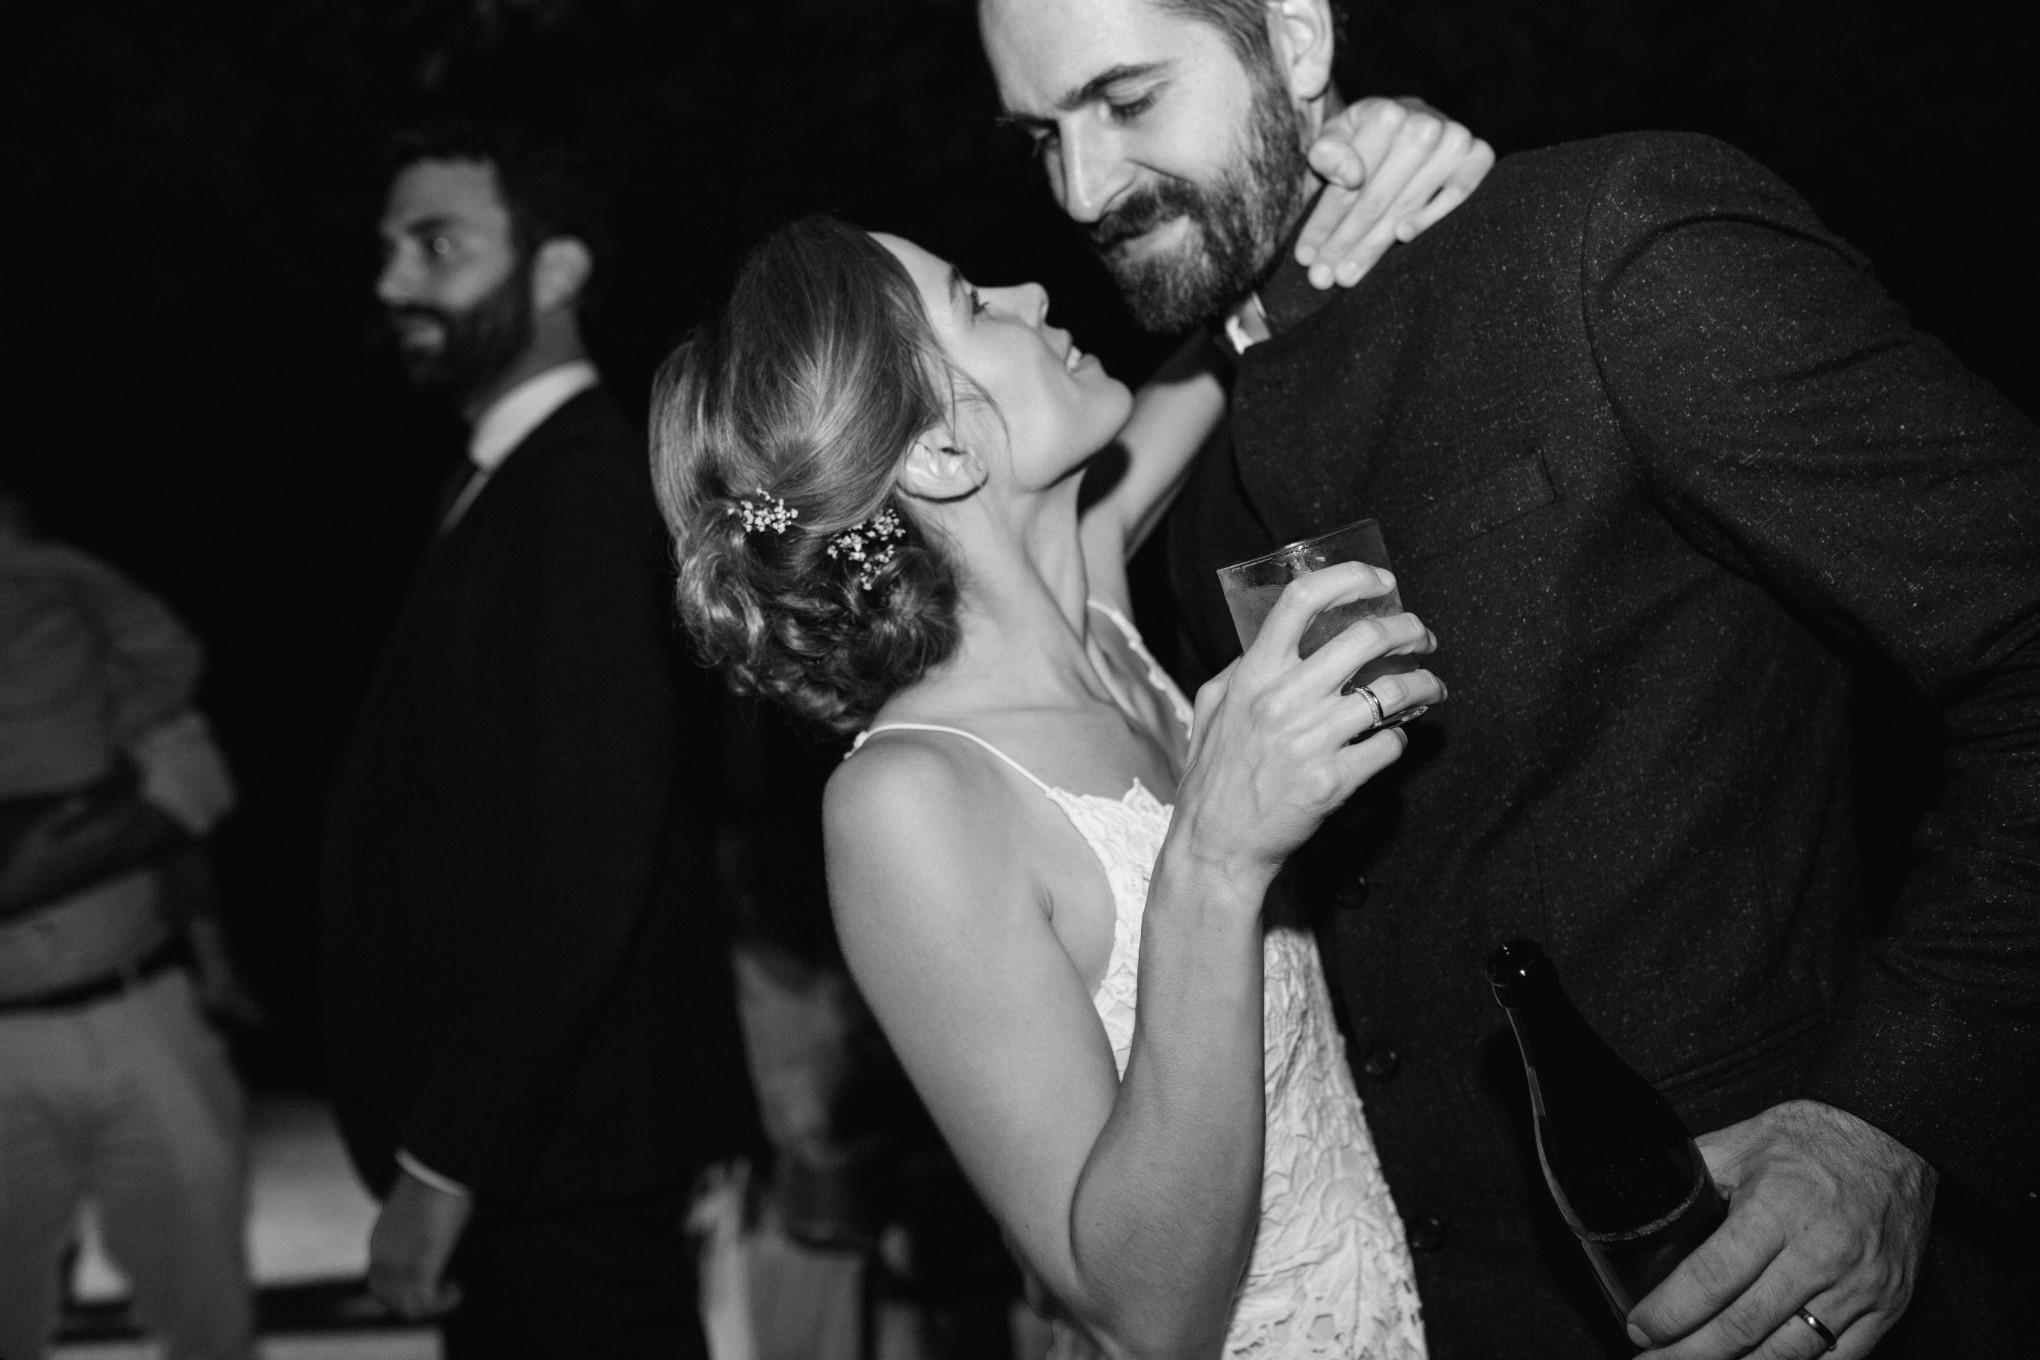 Berlin-Wannsee-Pia-Anna-Christian-Wedding-Photography-ST-111.jpg